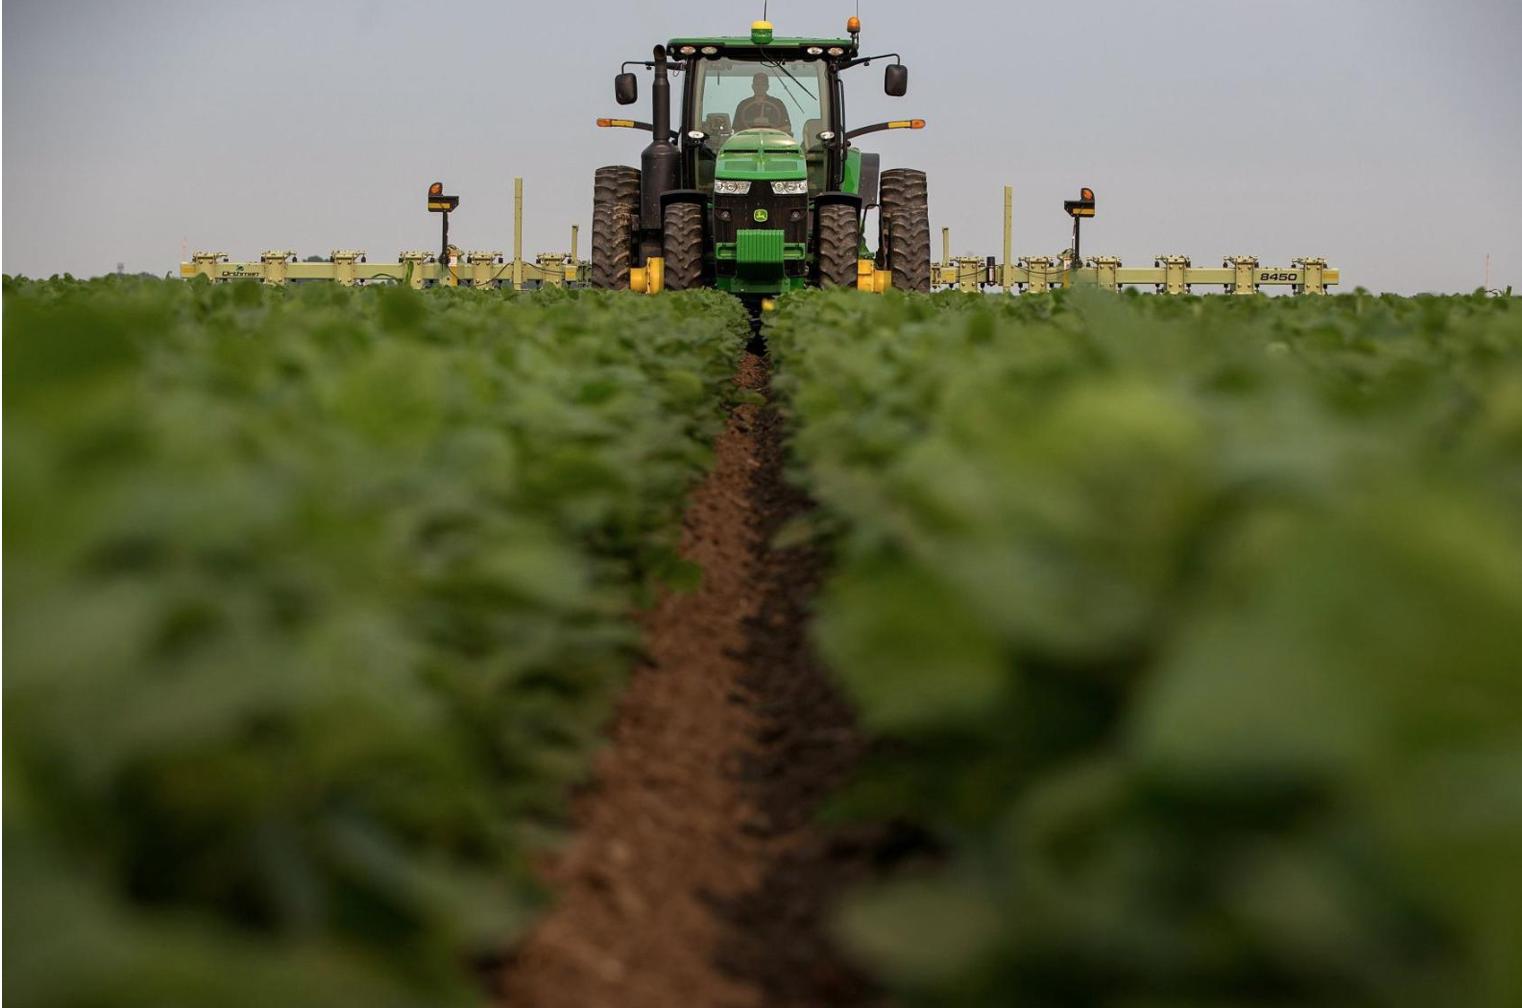 EDITORIAL: LEGISLATION PROMOTES A SOIL HEALTH INITIATIVE FOR NEBRASKA AGRICULTURE